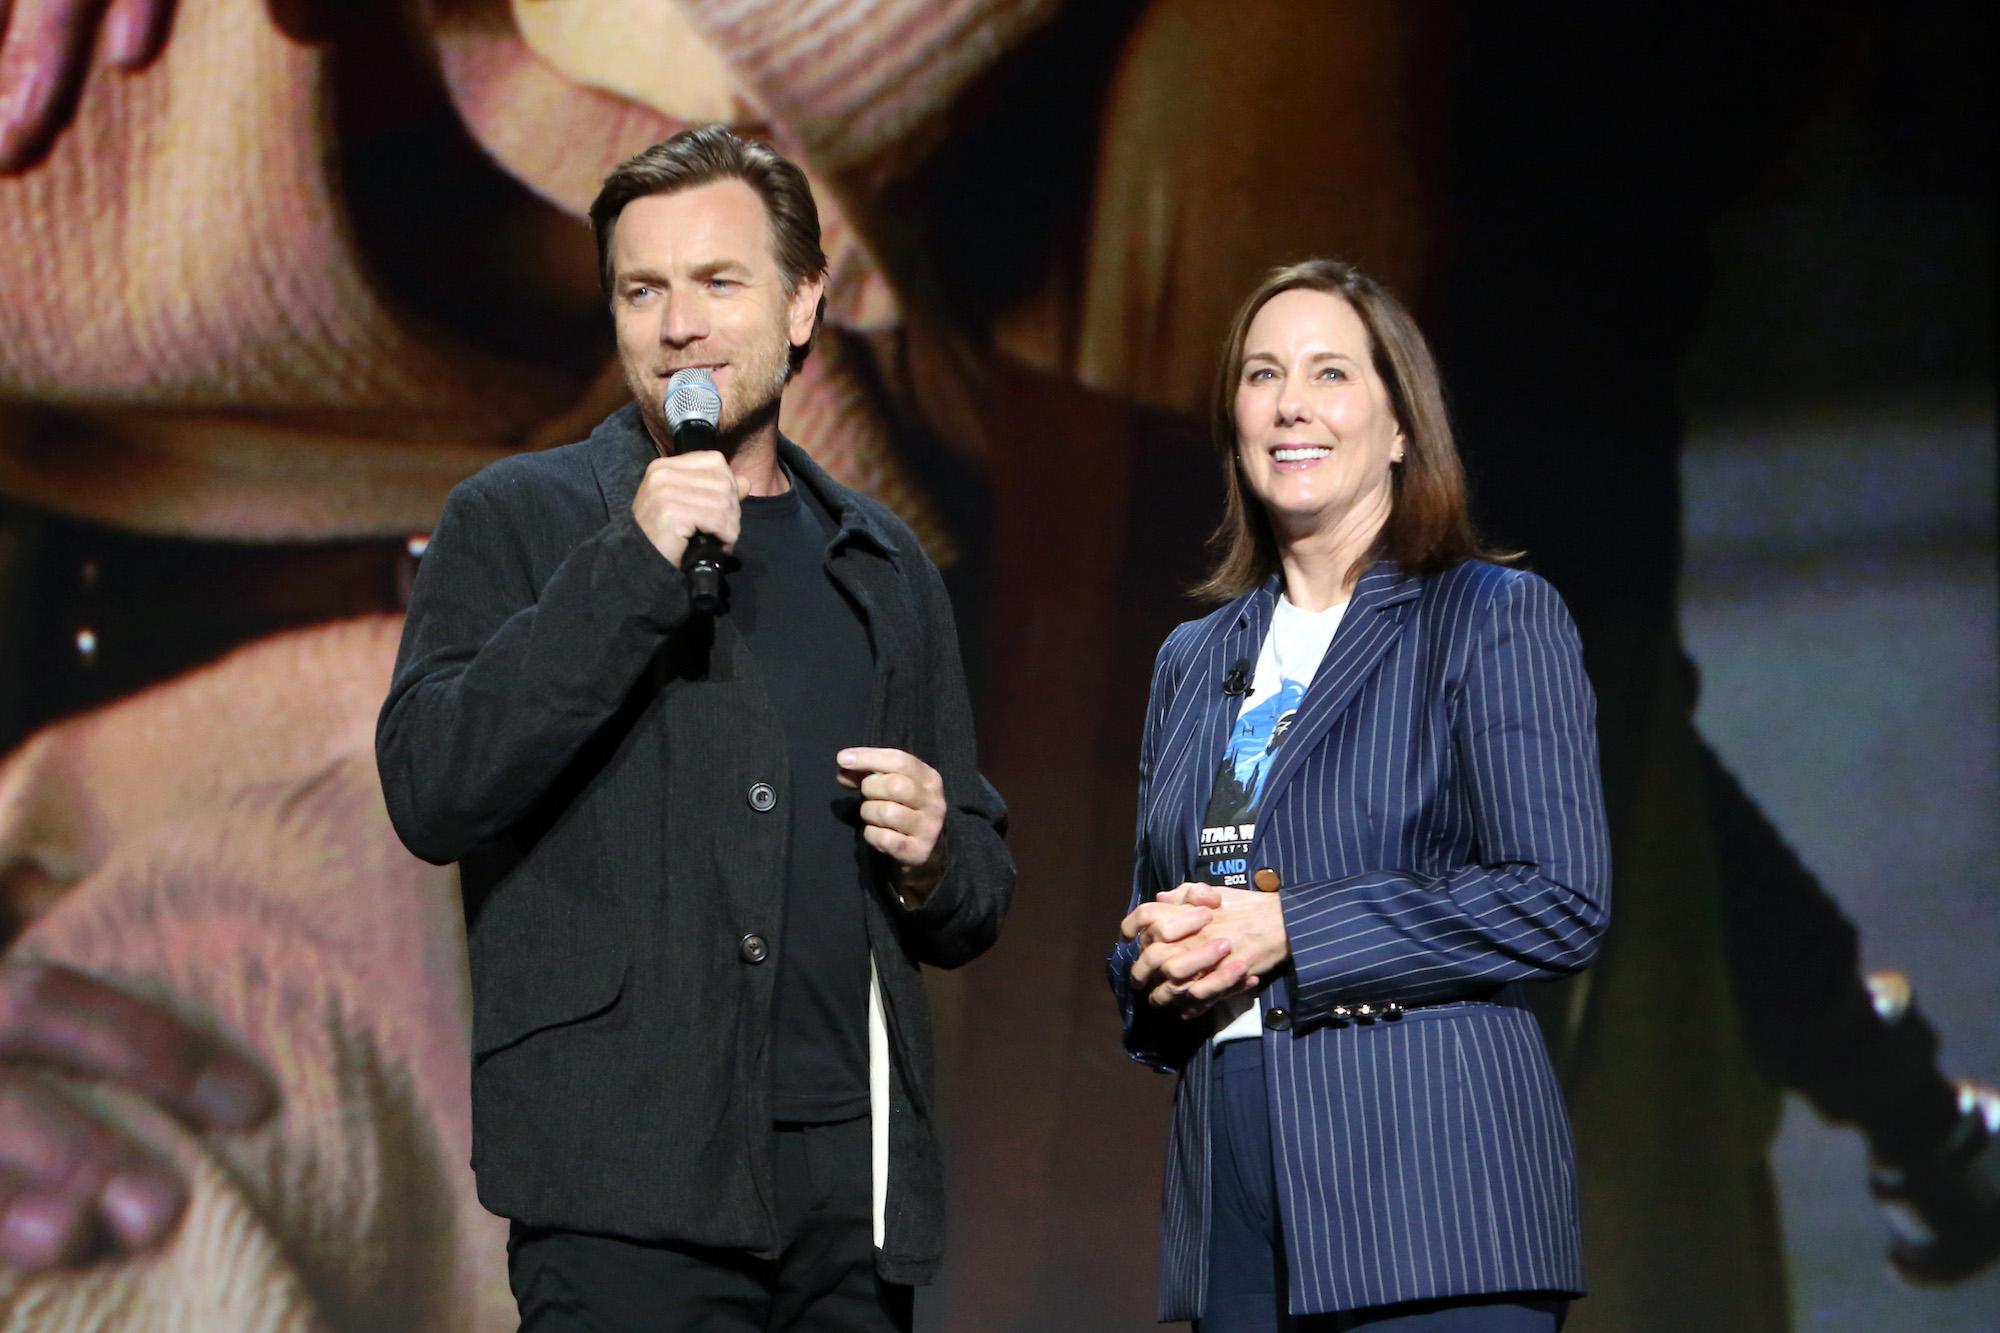 Ewan McGregor of the 'Obi-Wan Kenobi' series and Lucasfilm president Kathleen Kennedy at Disney's D23 EXPO 2019